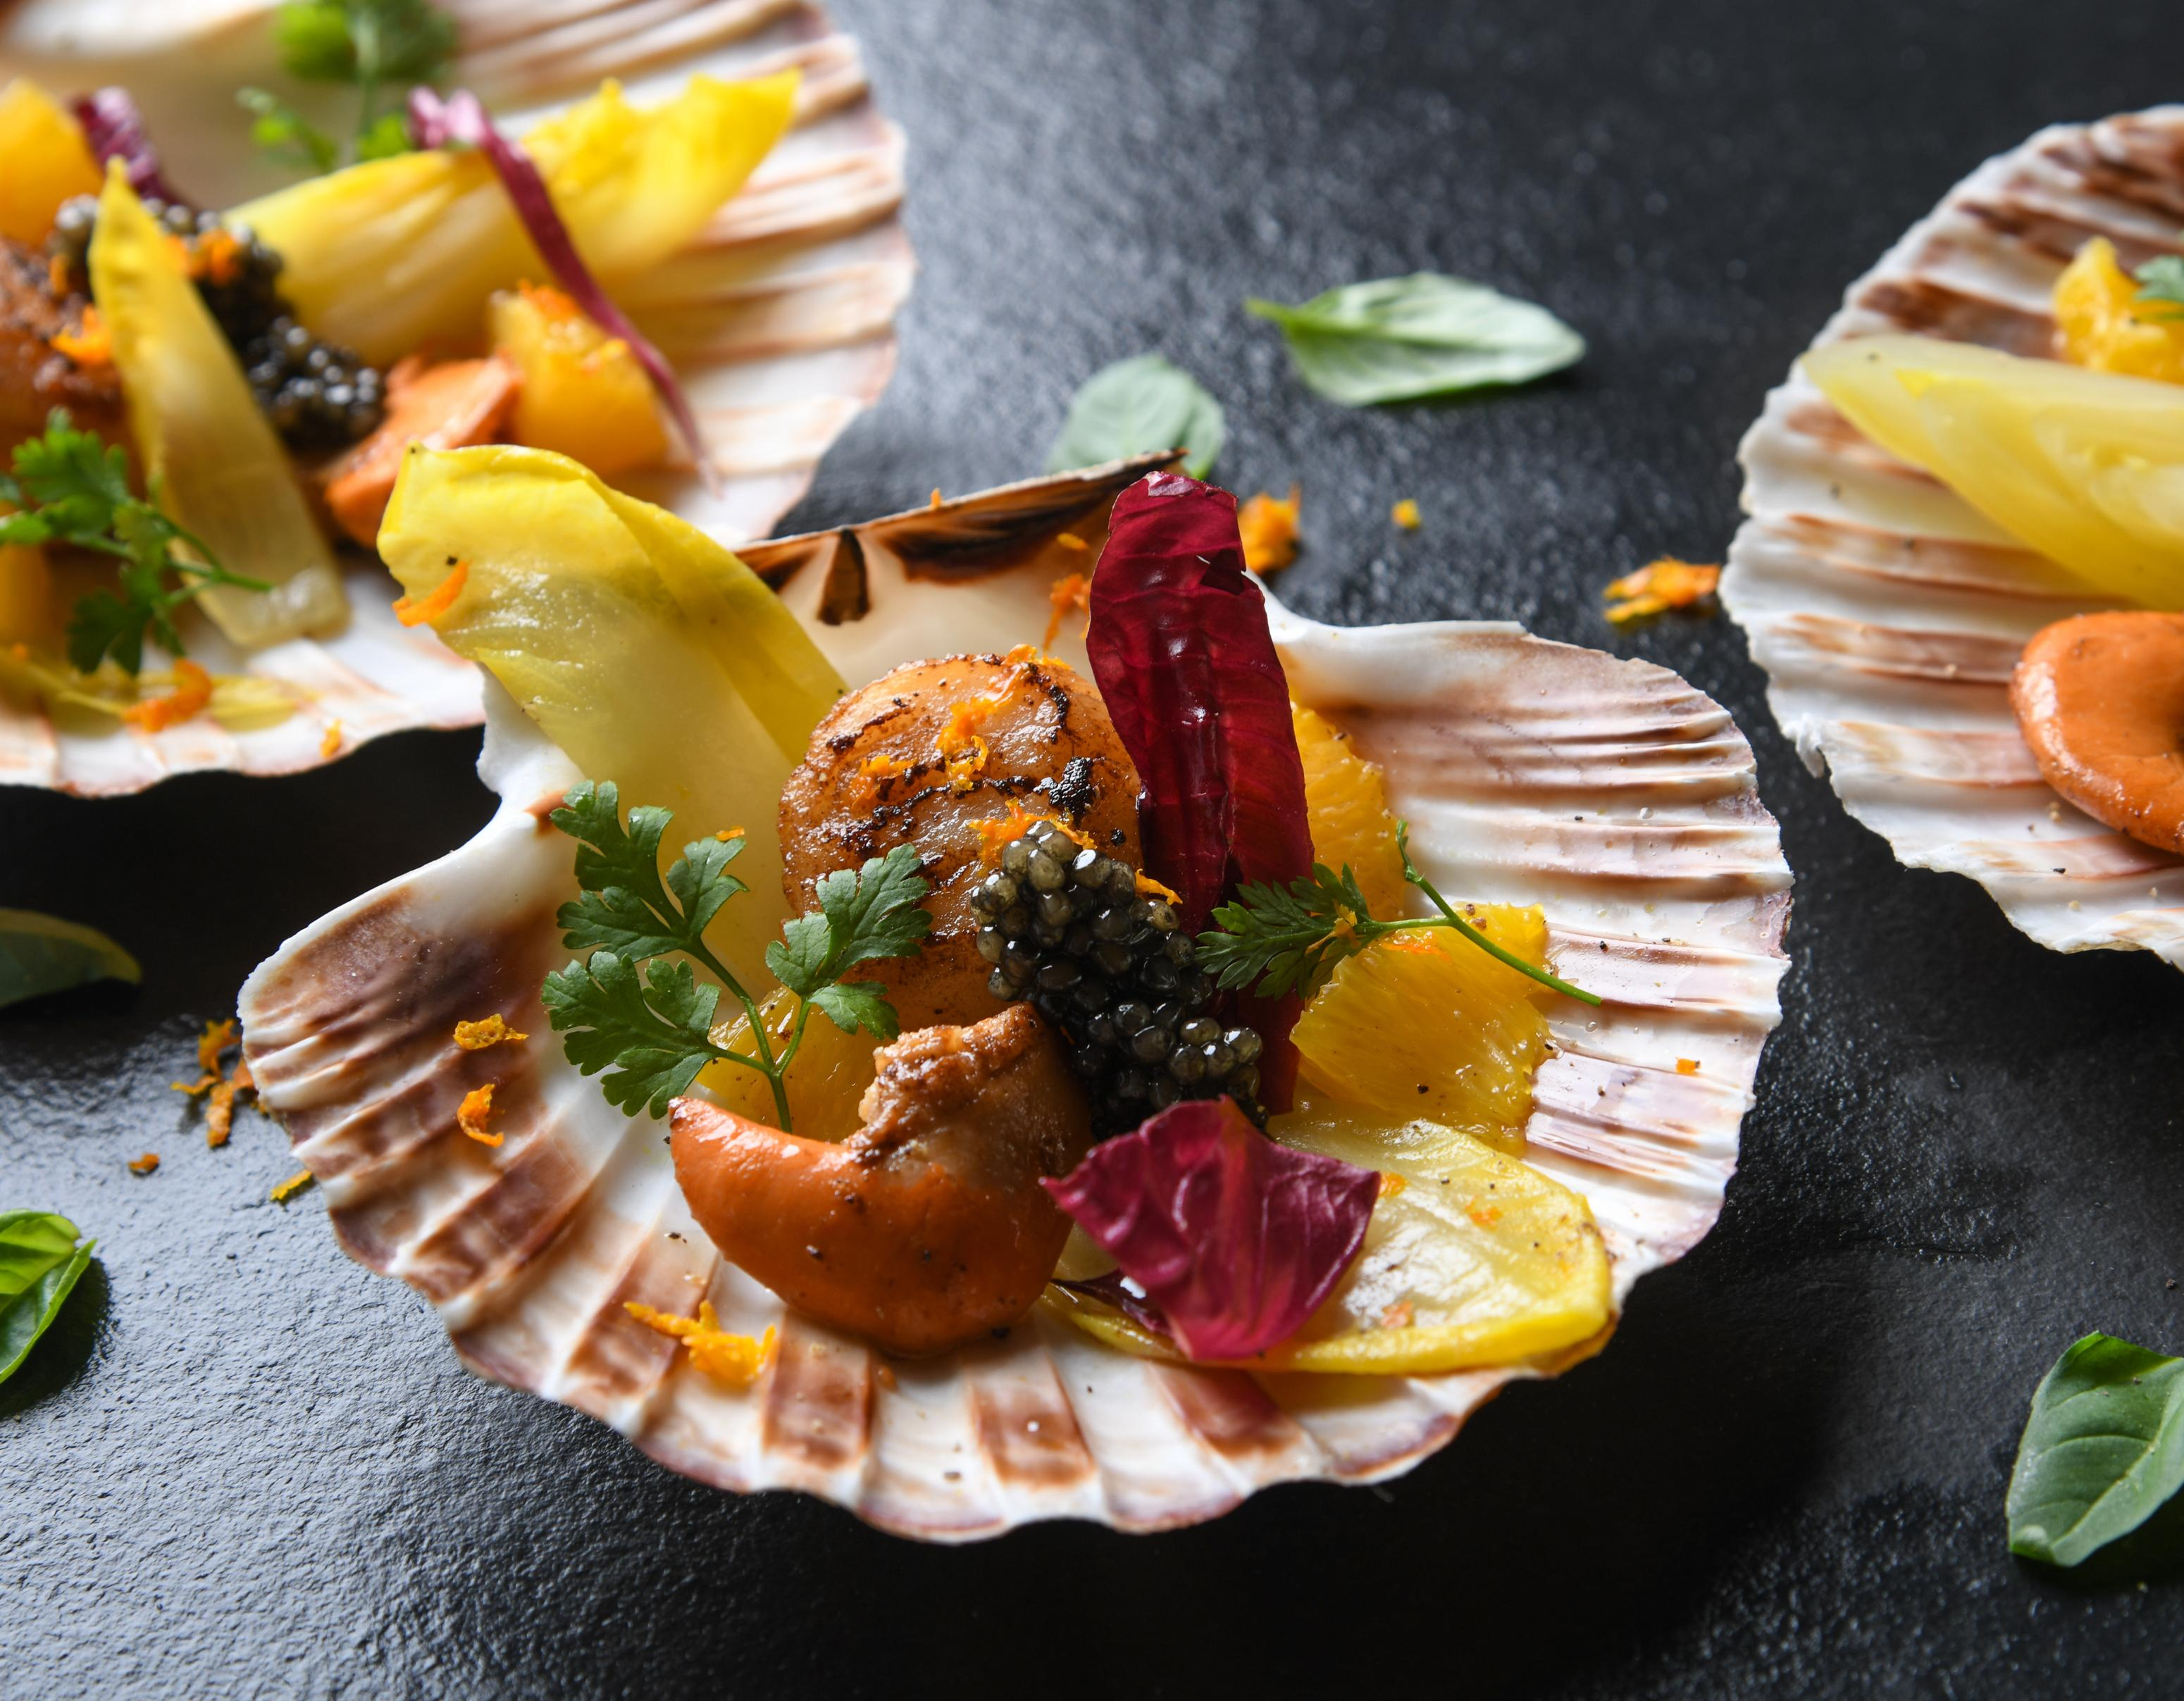 Jakobsmuscheln mit Kaviar